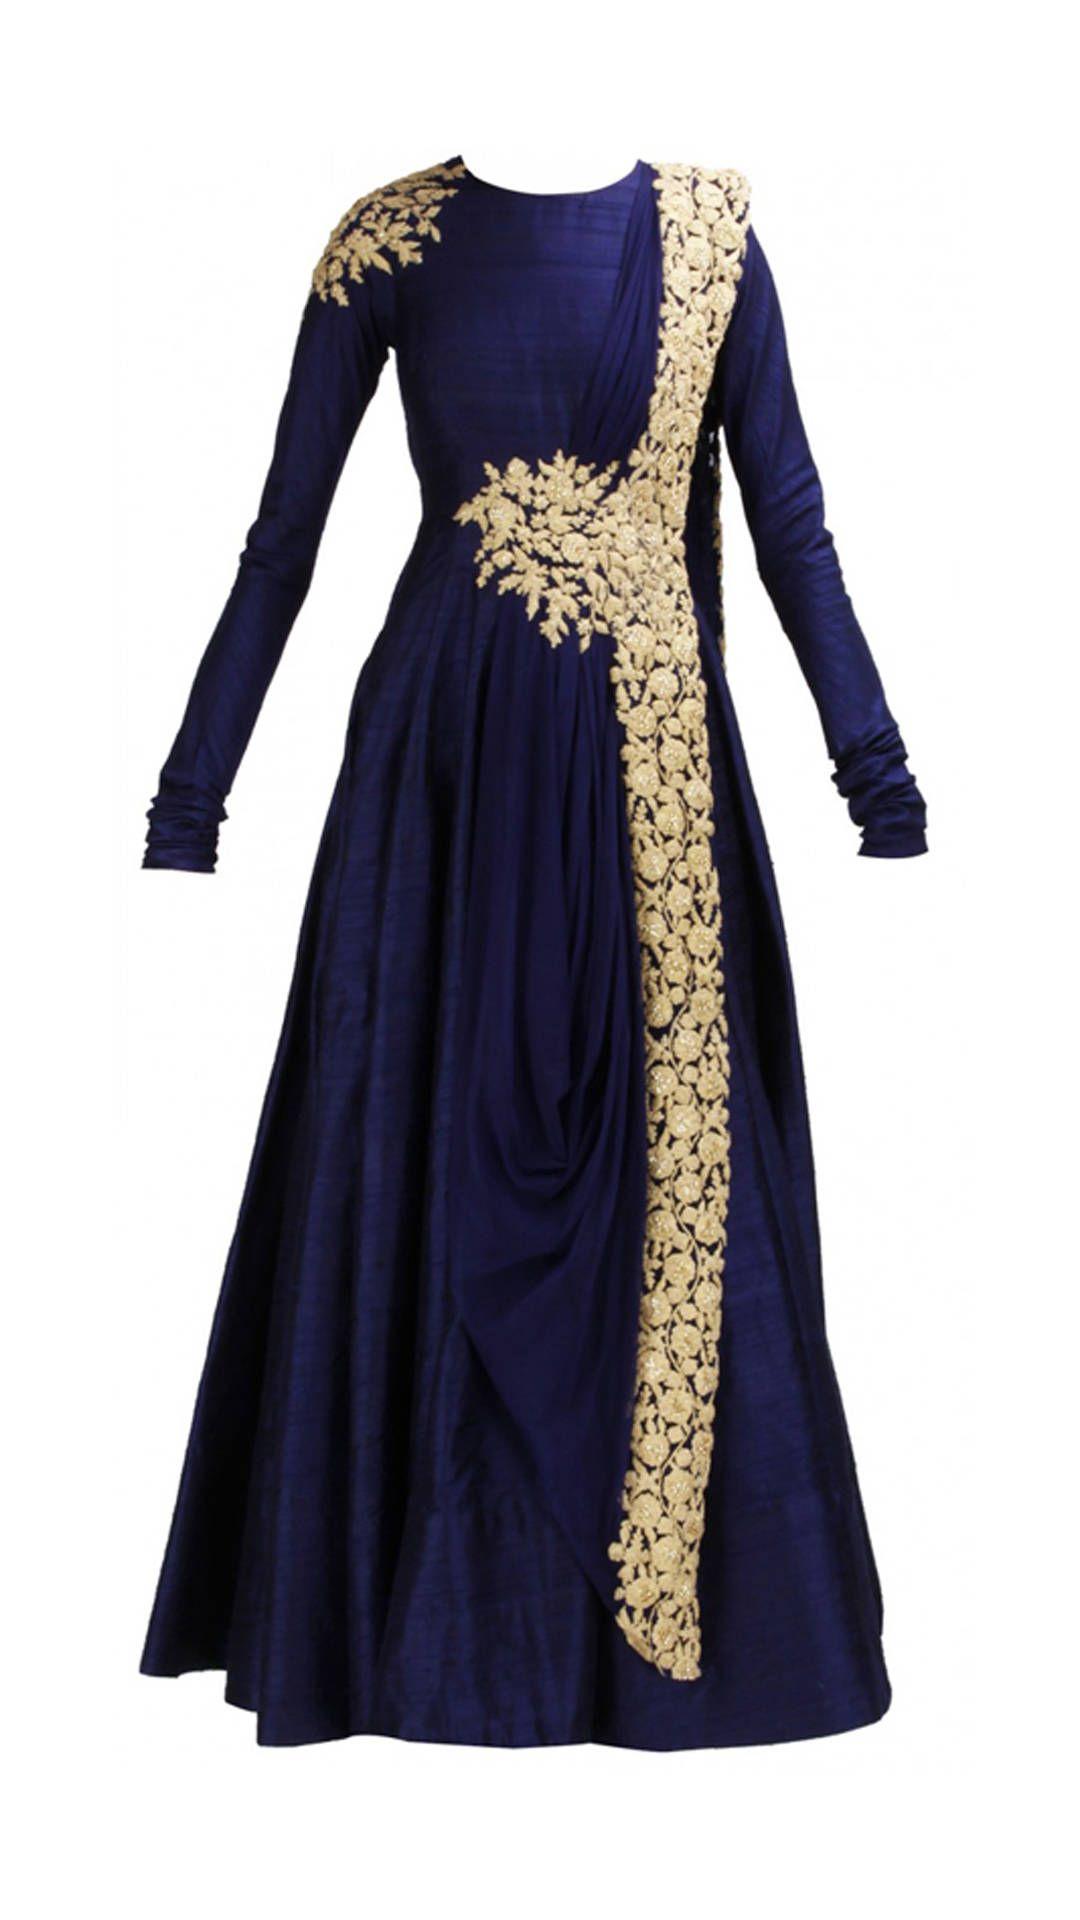 Raw Silk Dark Blue Prom Dress – Fashion design images